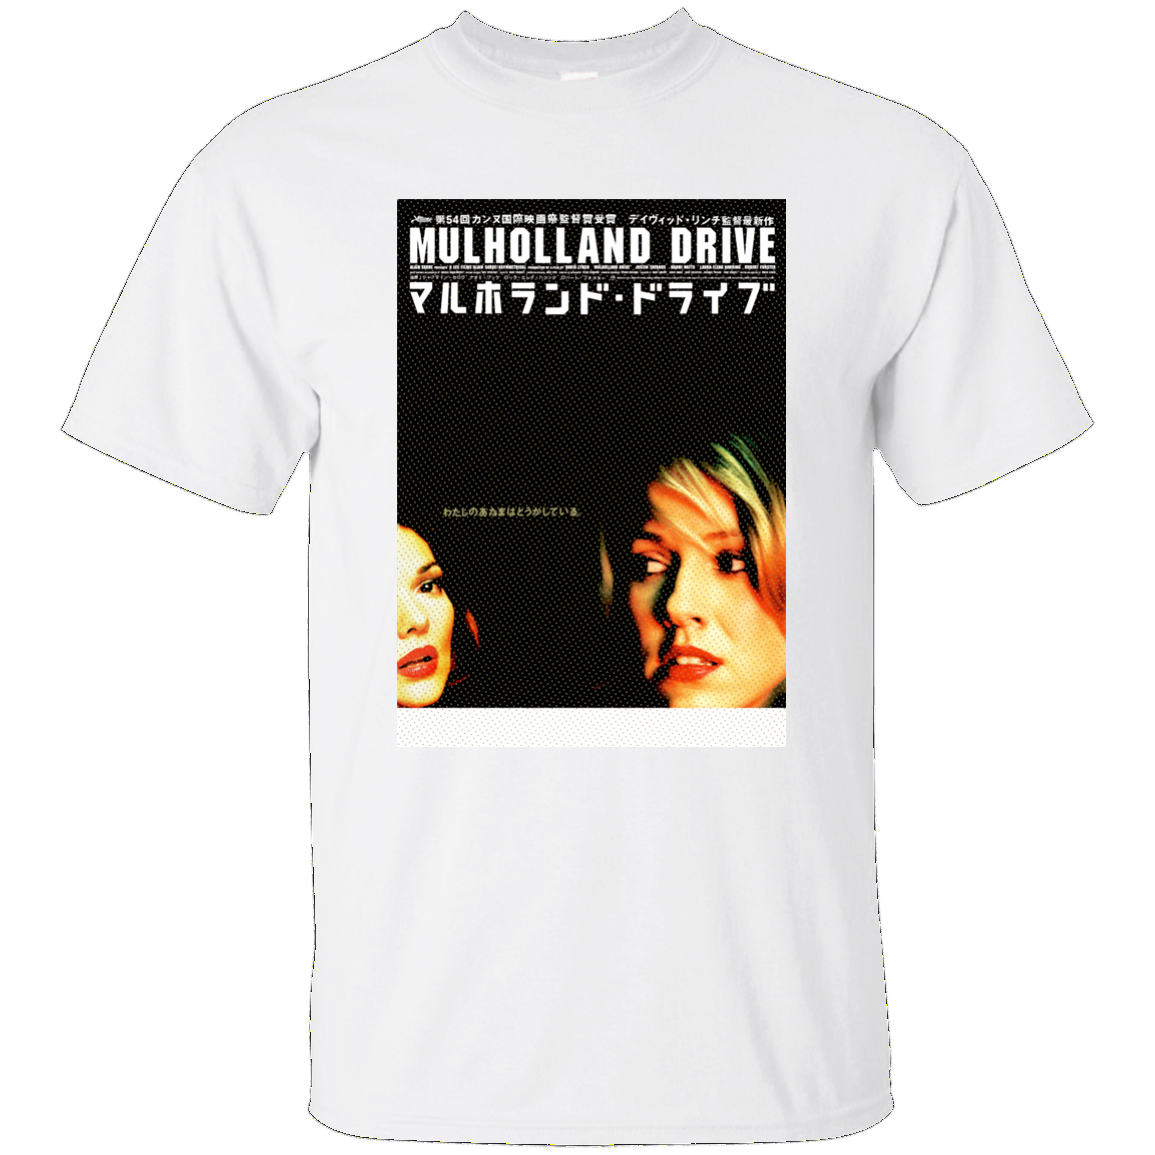 David Lynch T Shirt director twin peaks mulholland drive eraserhead tv fire